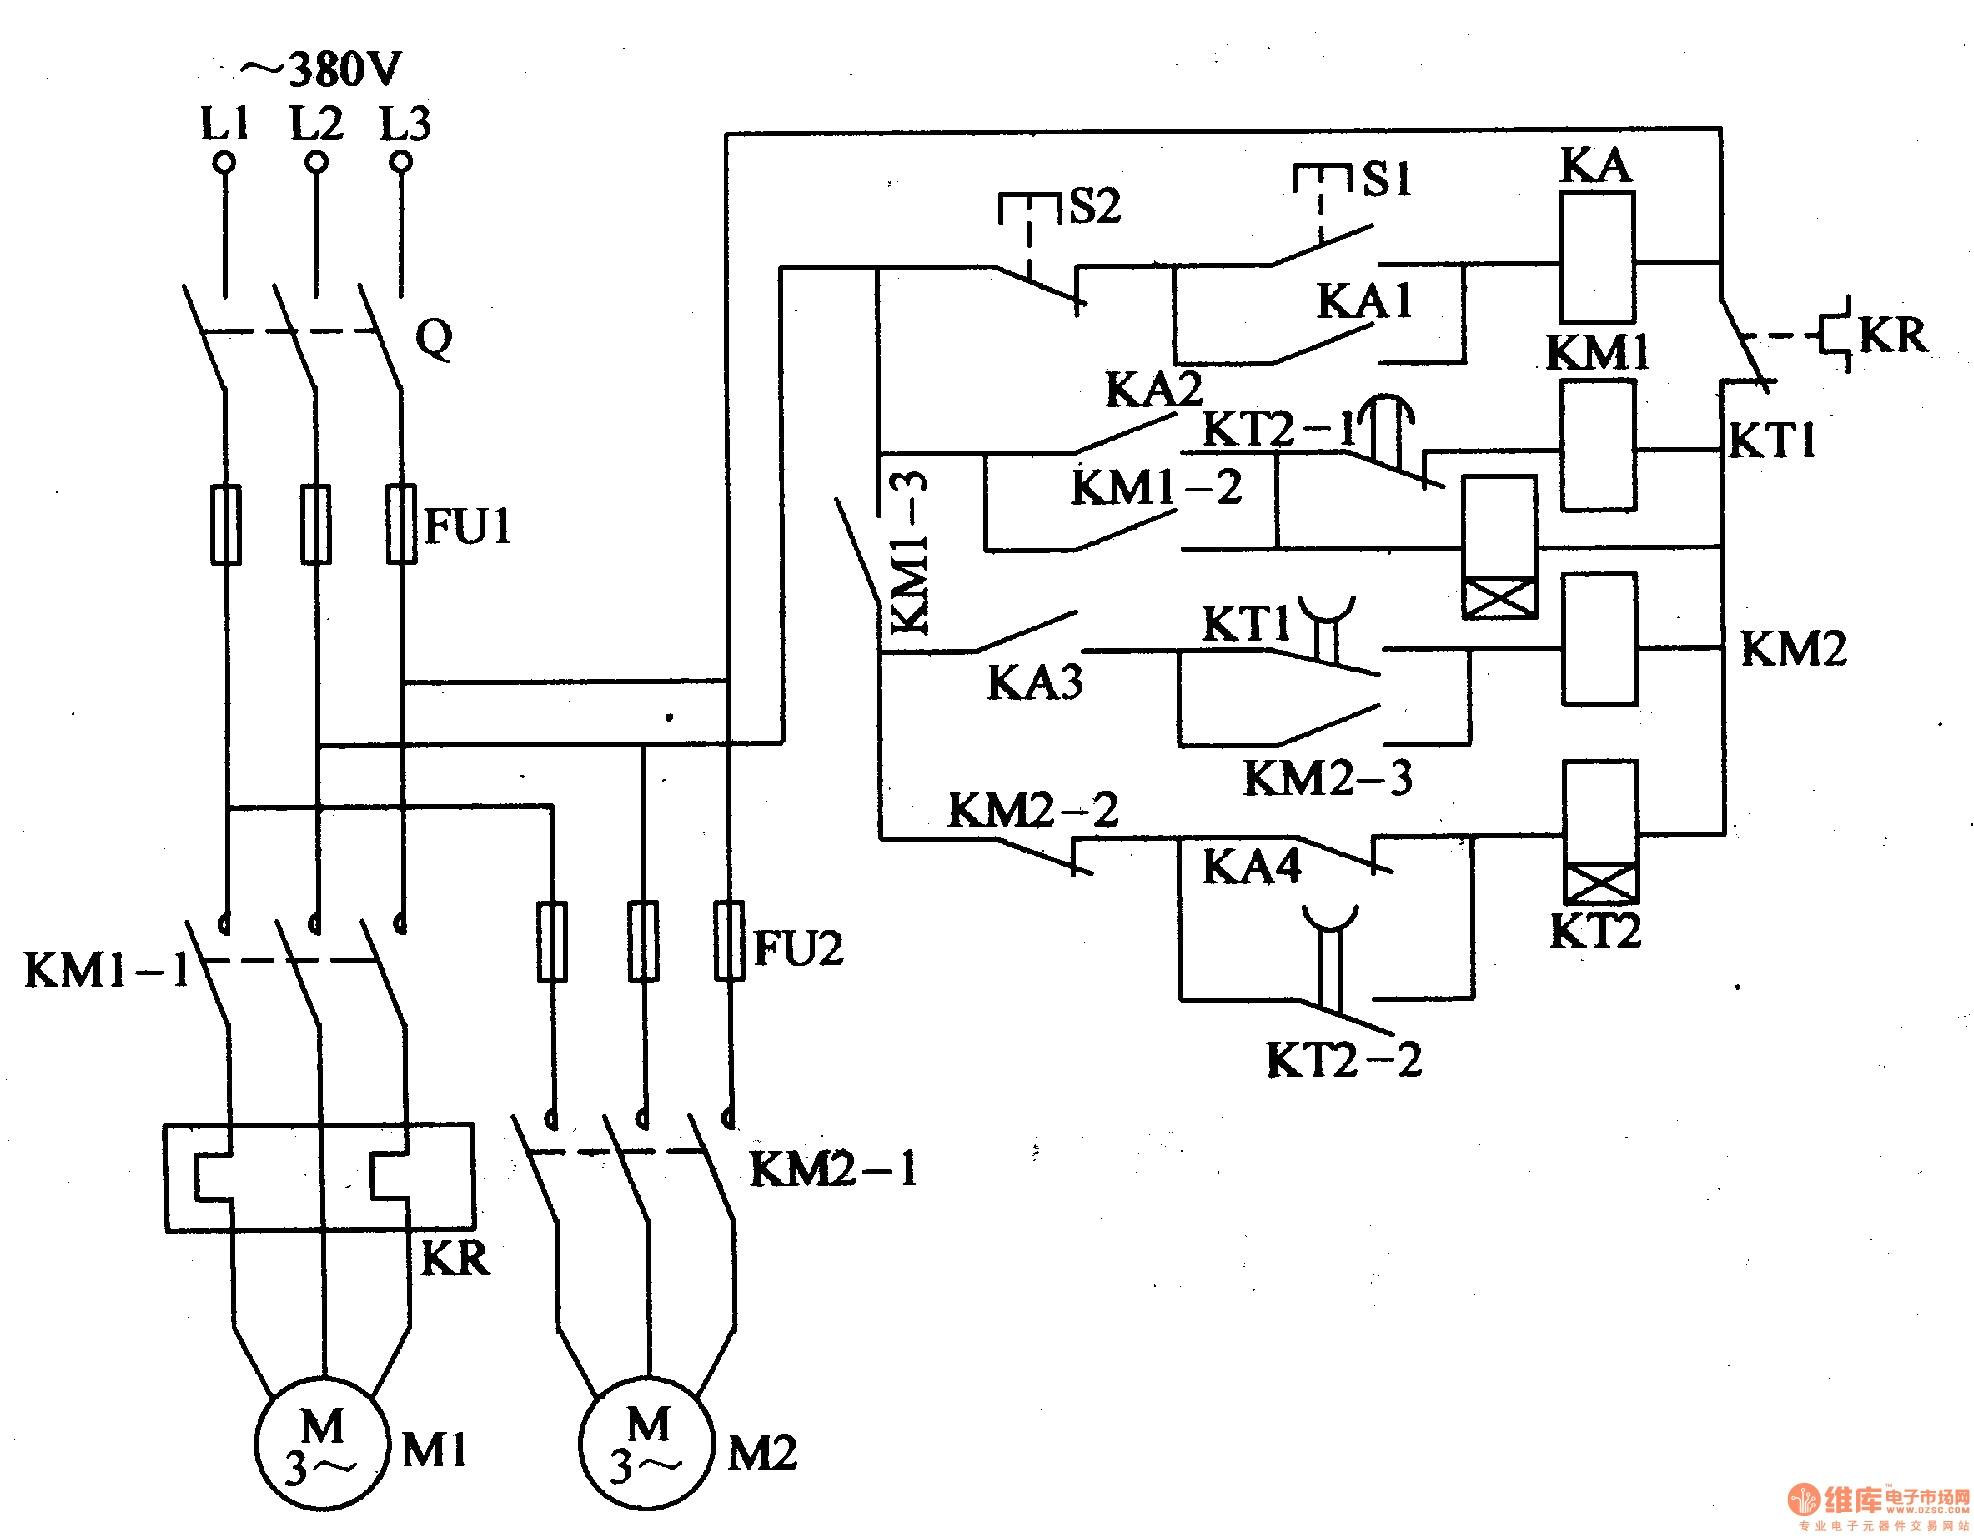 Electrical Panel Board Wiring Diagram Pdf Control Wiring Diagram Pdf Wiring Diagram Fascinating